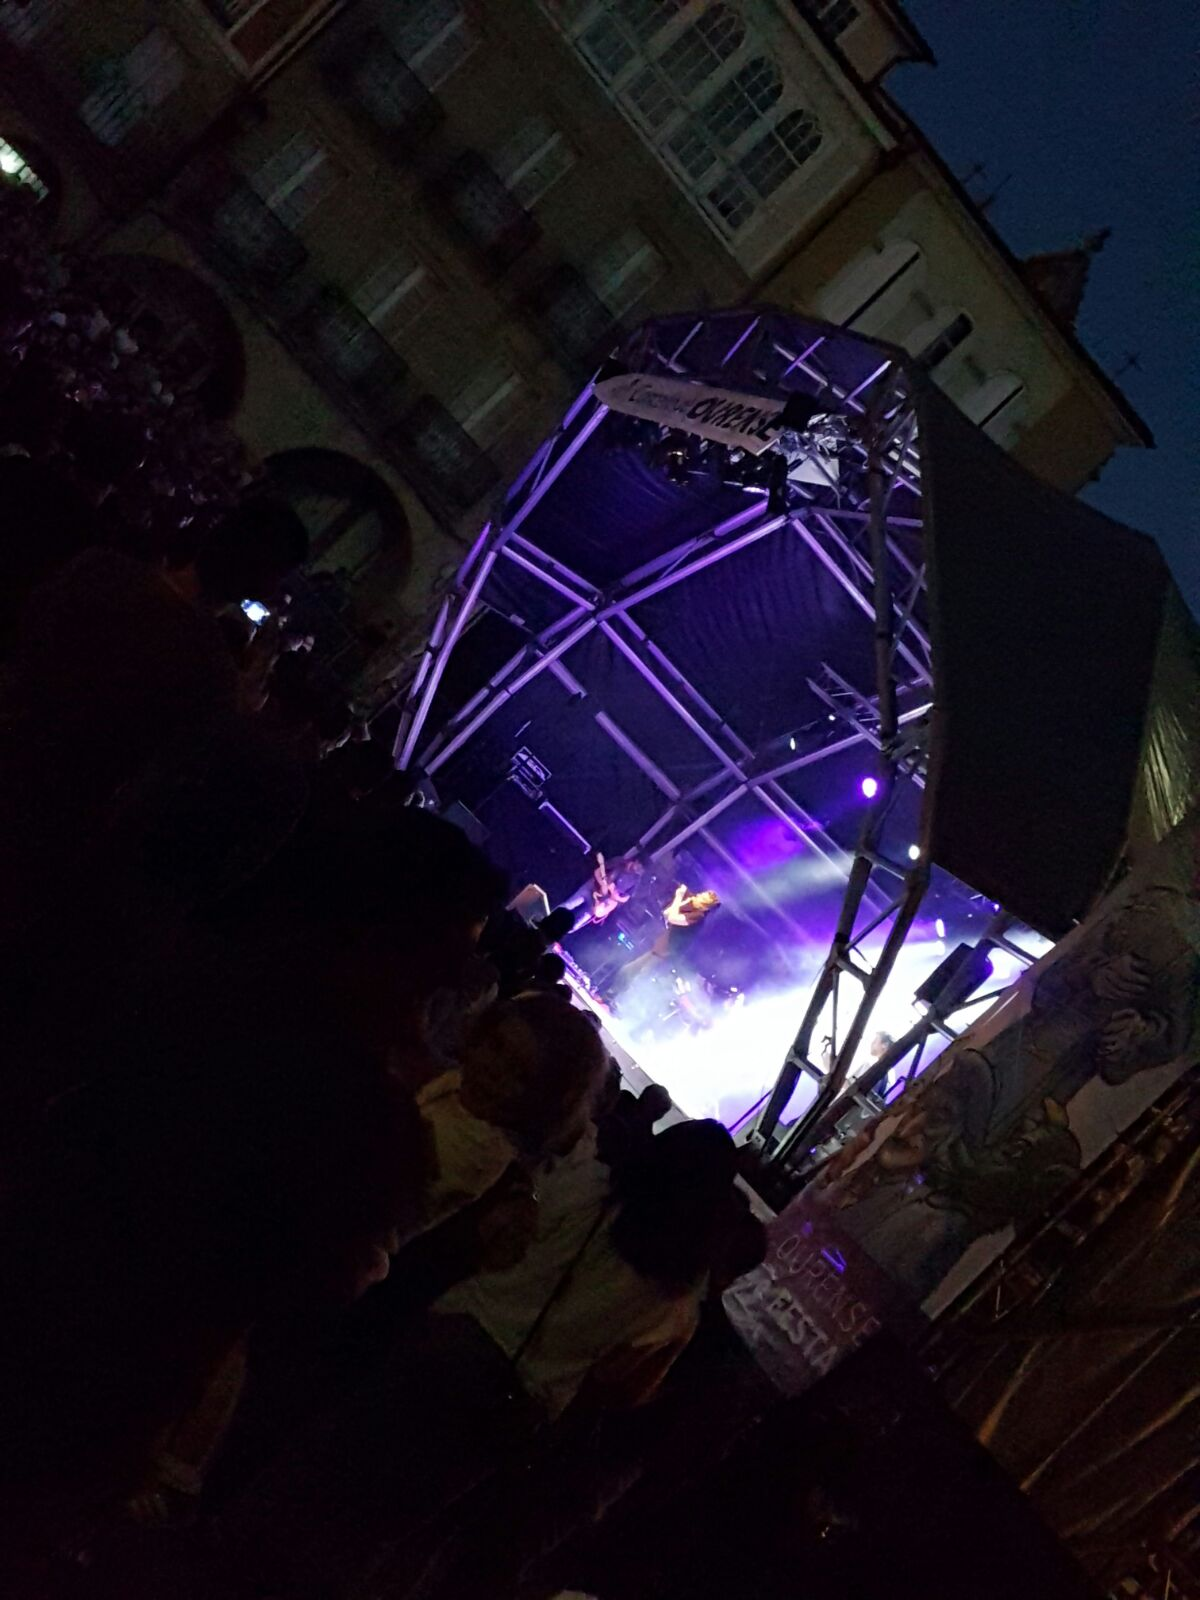 Fiestas de Ourense